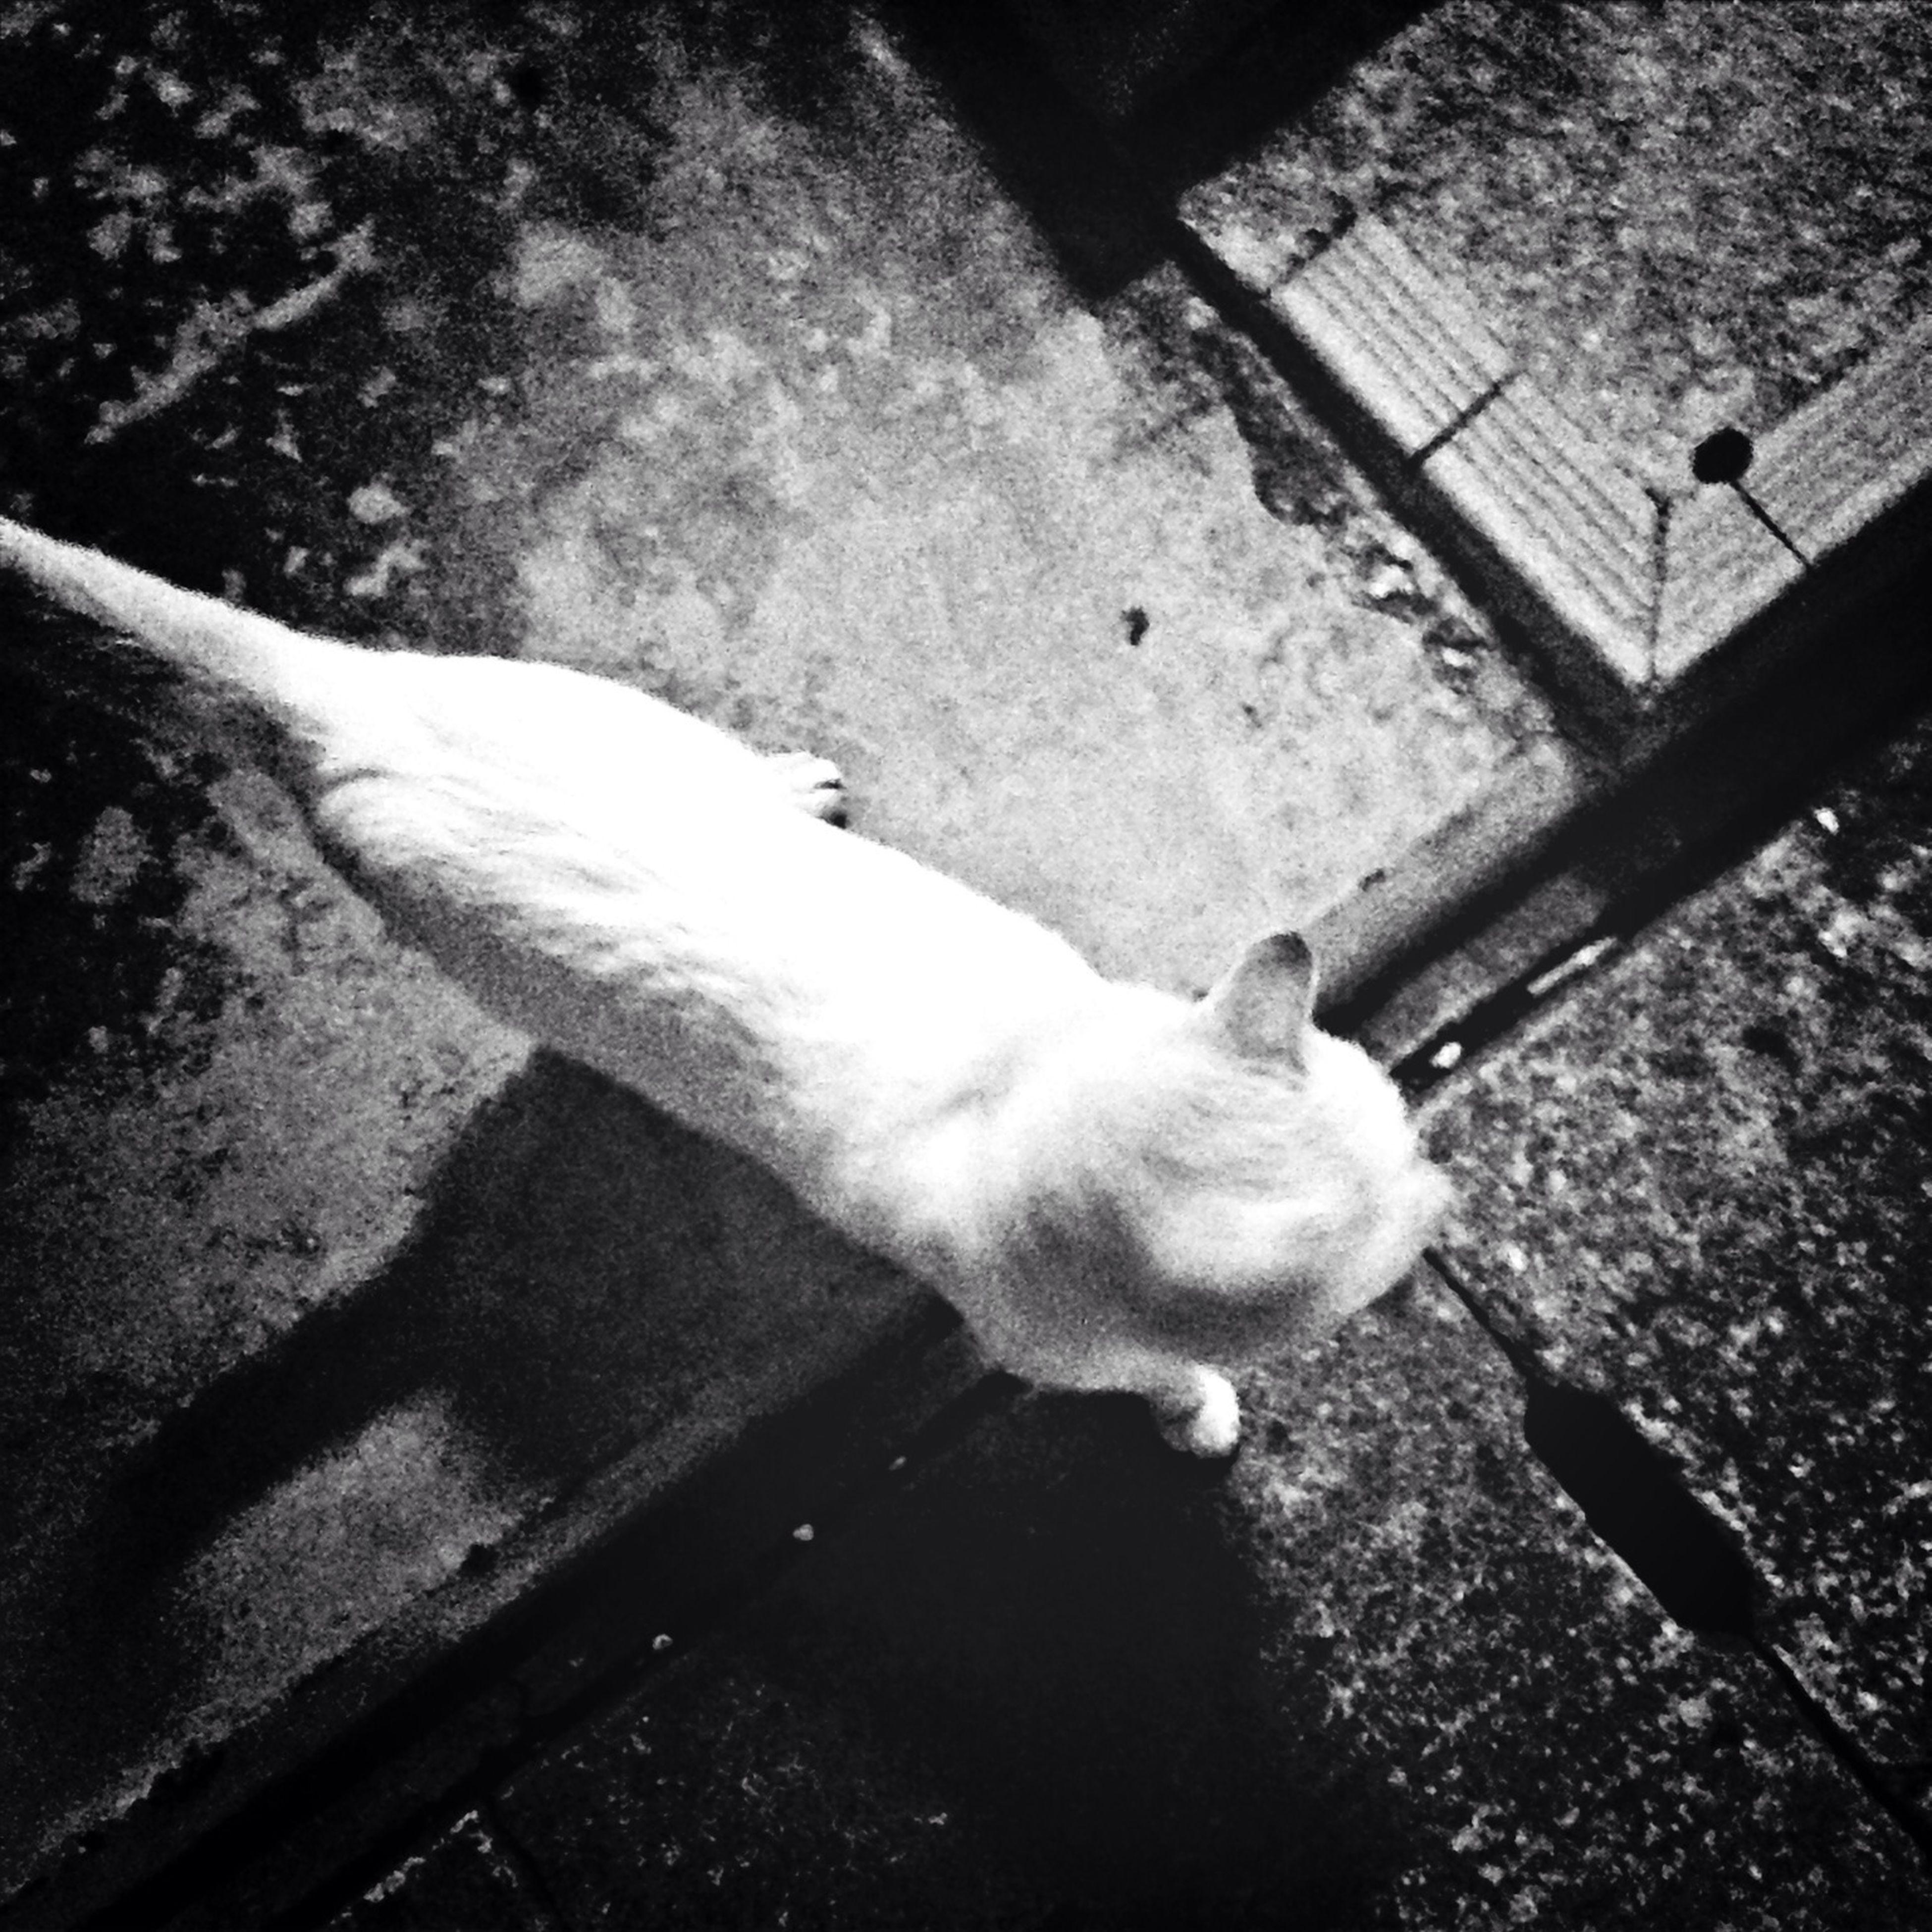 animal themes, one animal, domestic animals, pets, mammal, high angle view, domestic cat, cat, full length, feline, dog, sunlight, street, outdoors, shadow, day, wildlife, standing, sidewalk, walking